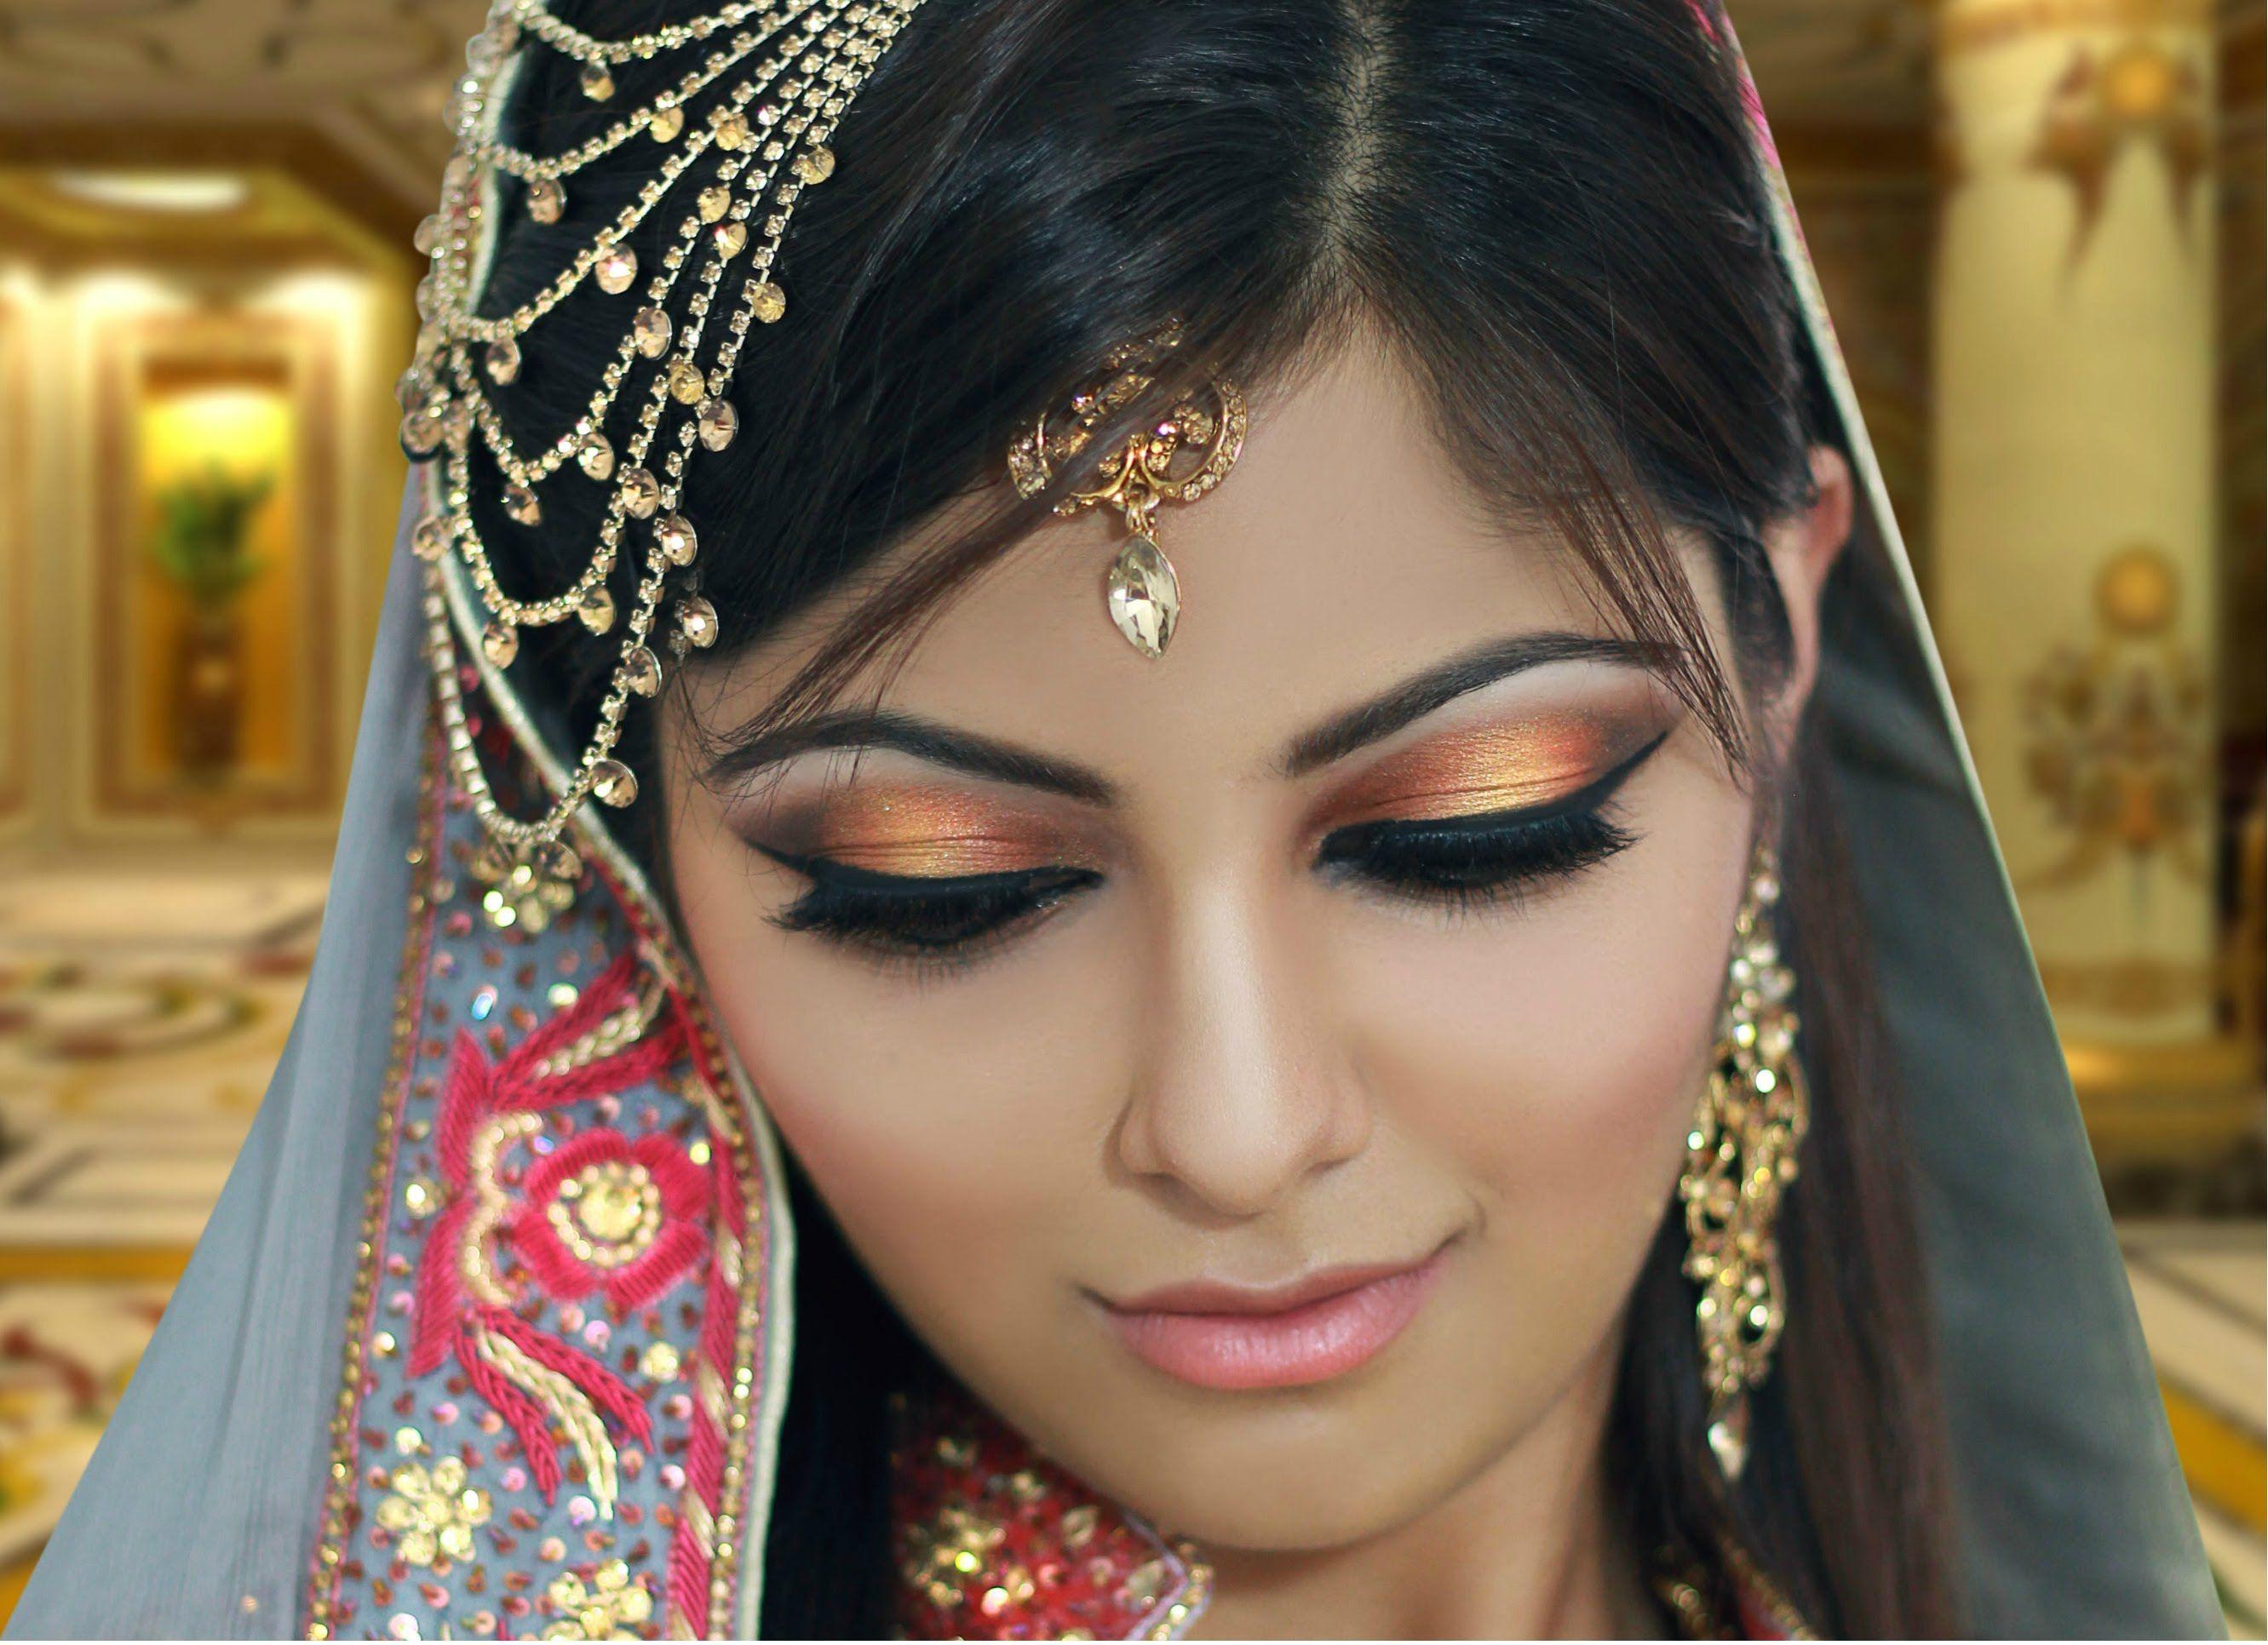 Uzma S Mehndi Makeup : Mehndi makeup anexa market